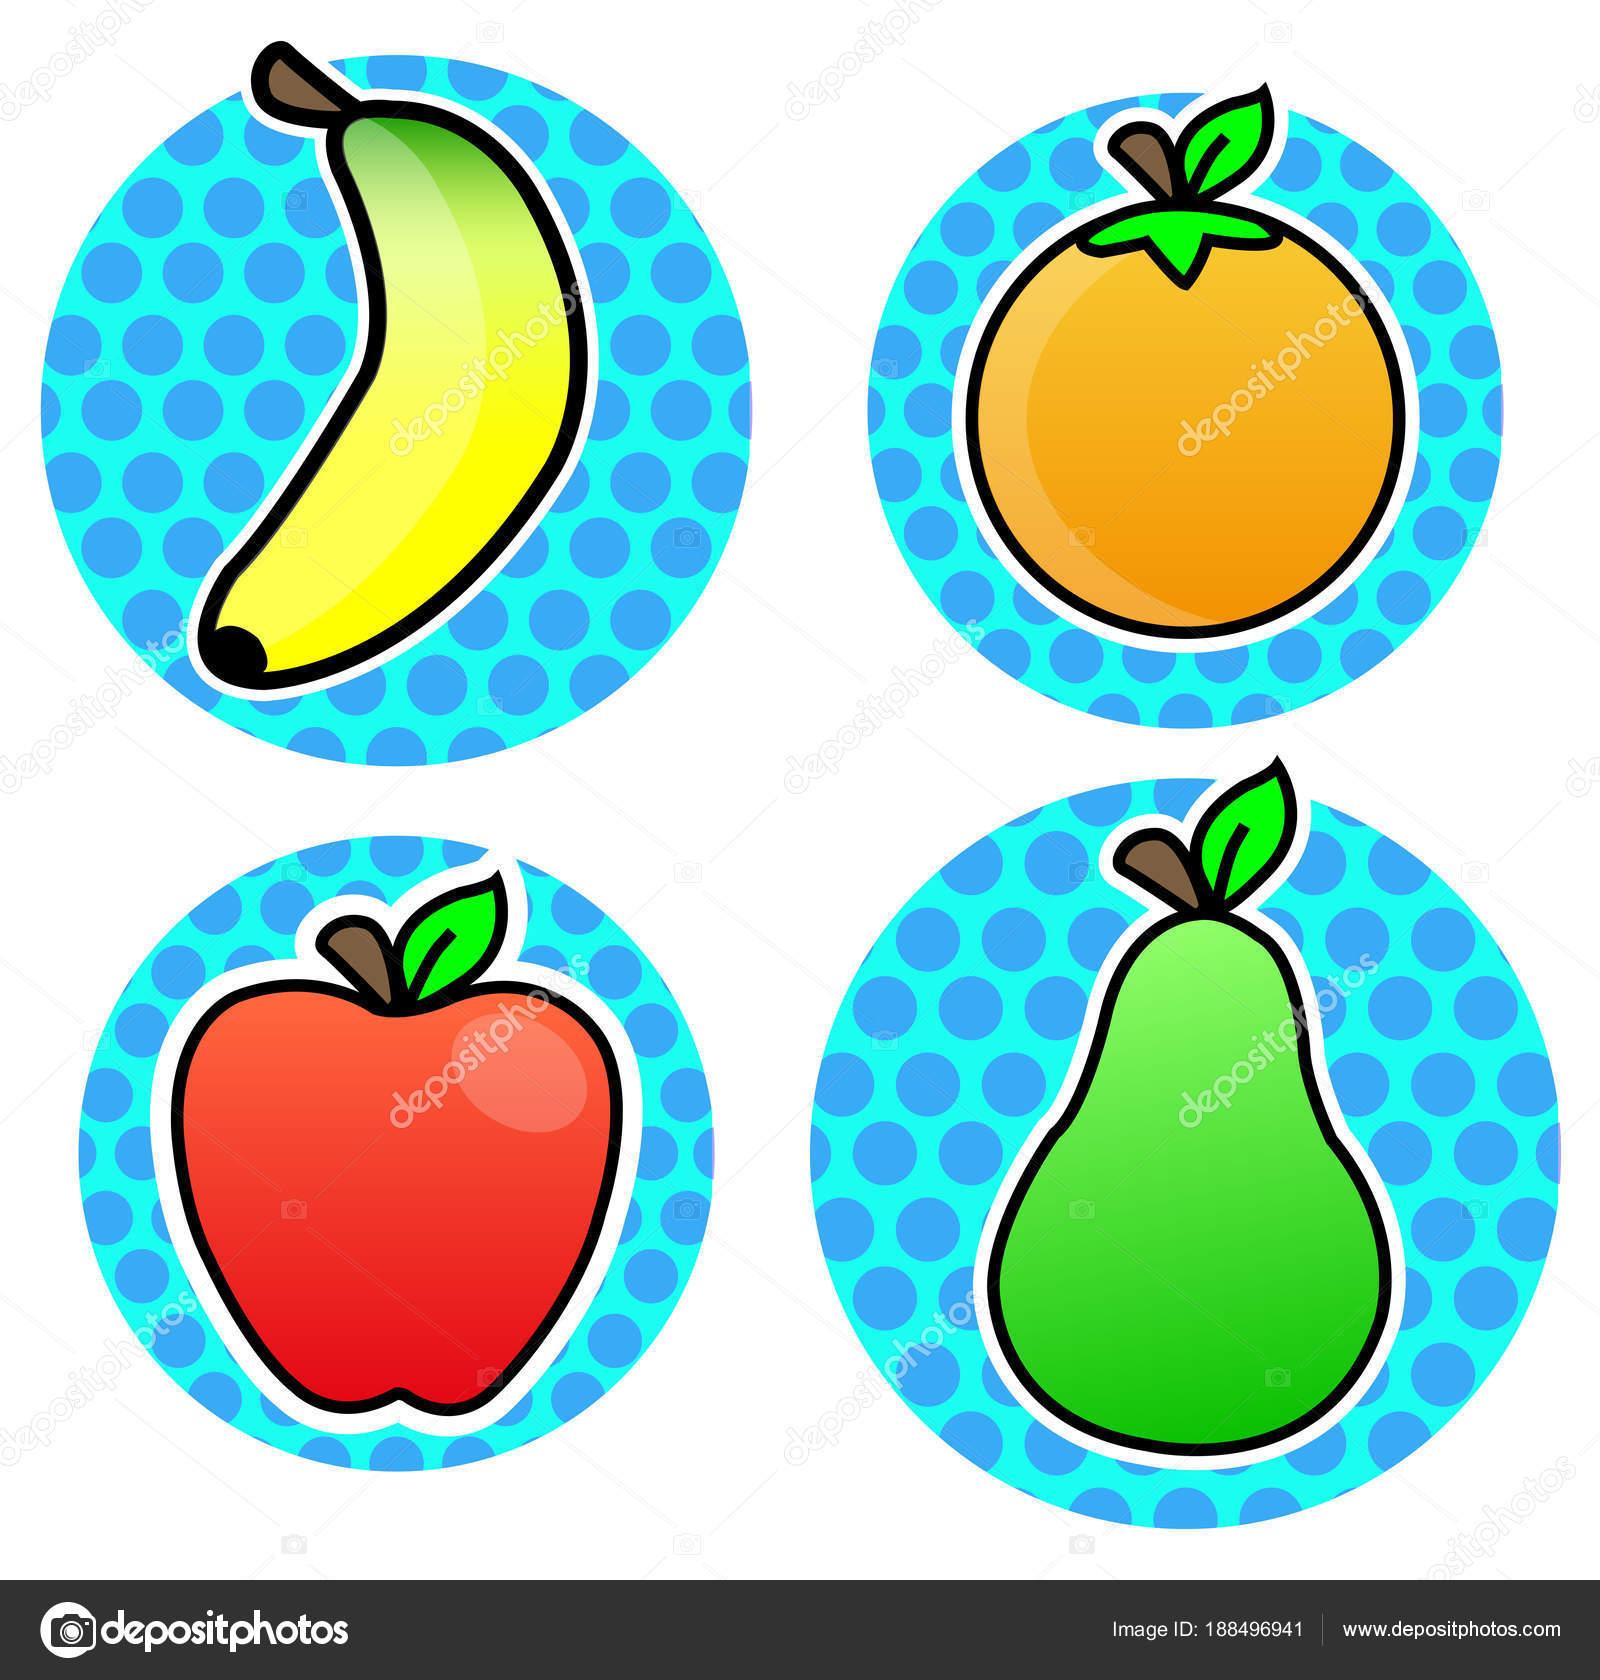 Manzana Pera Naranja Platano Naranja Platano Manzana Pera Fruta